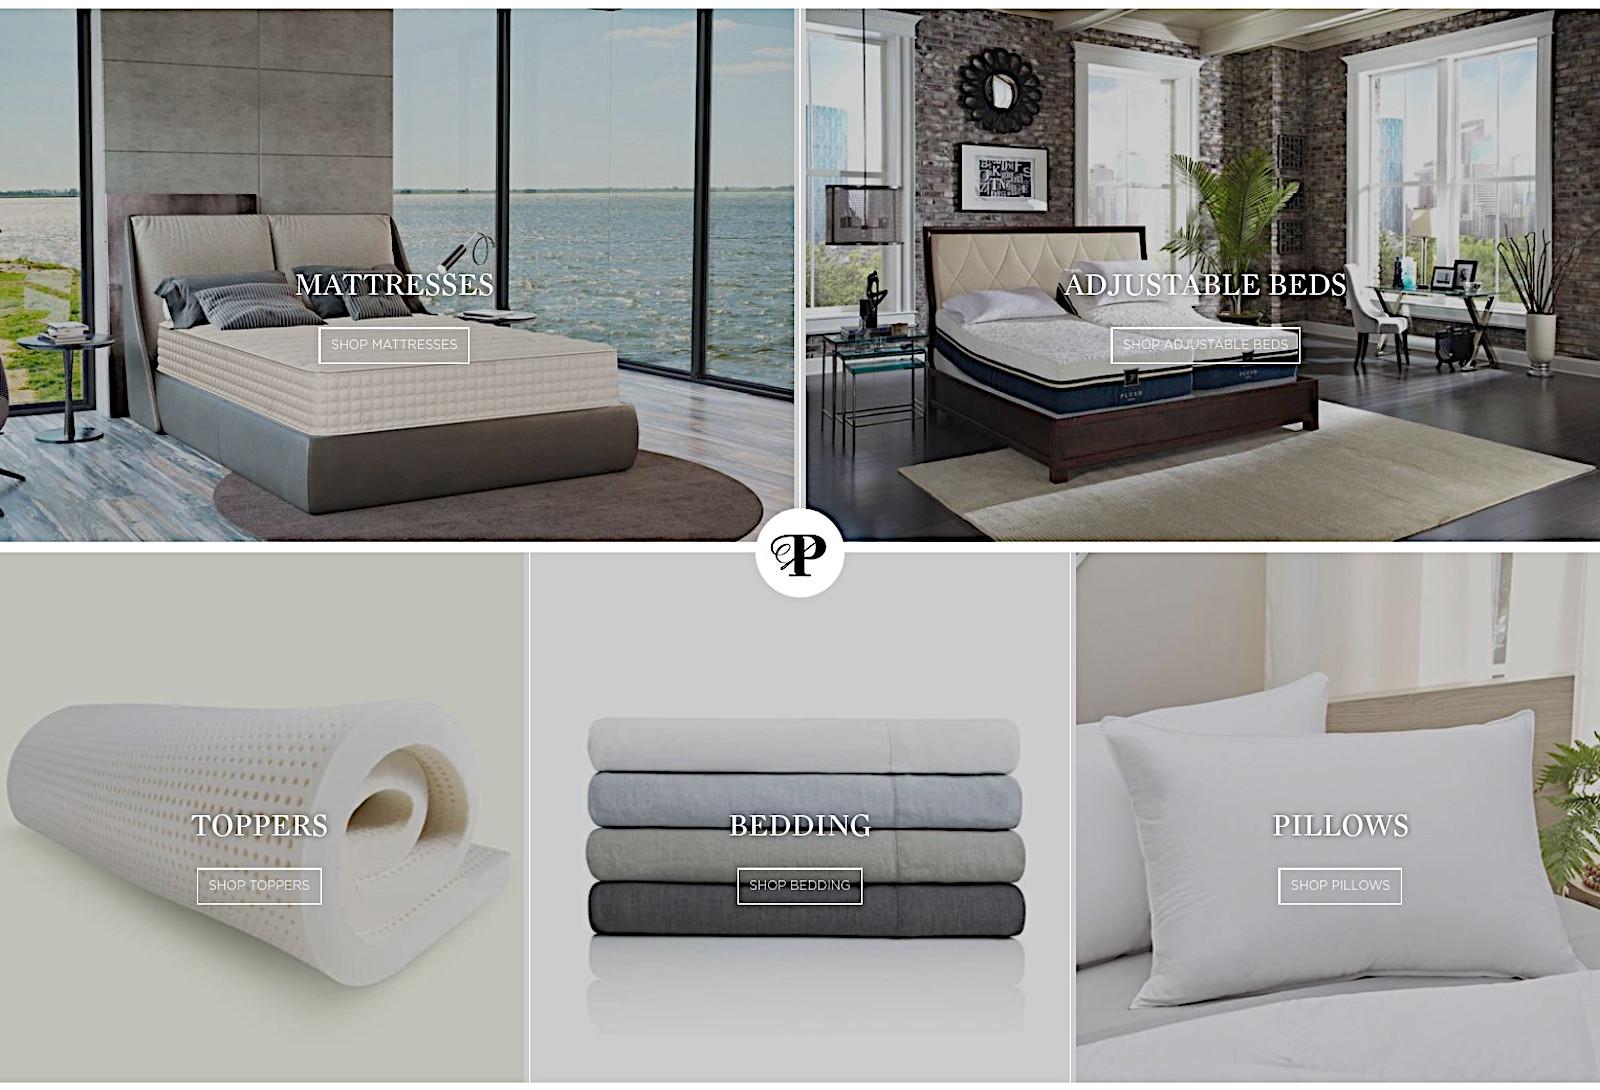 Mattresses Adjustable beds